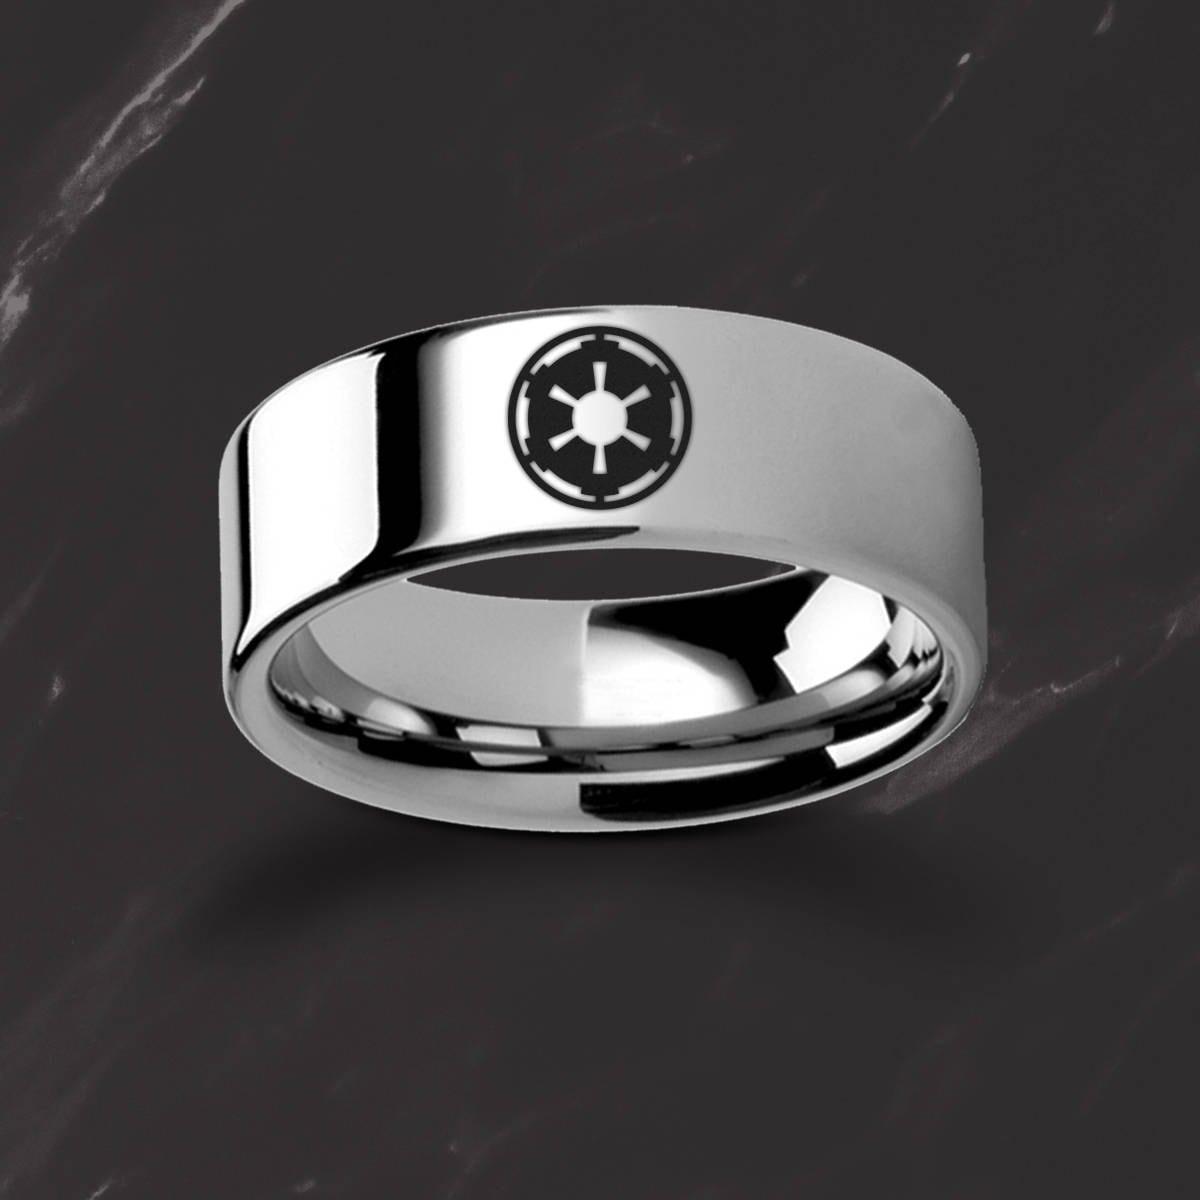 Engraved Star Wars Sith Imperial Emblem Symbol Tungsten Ring Flat